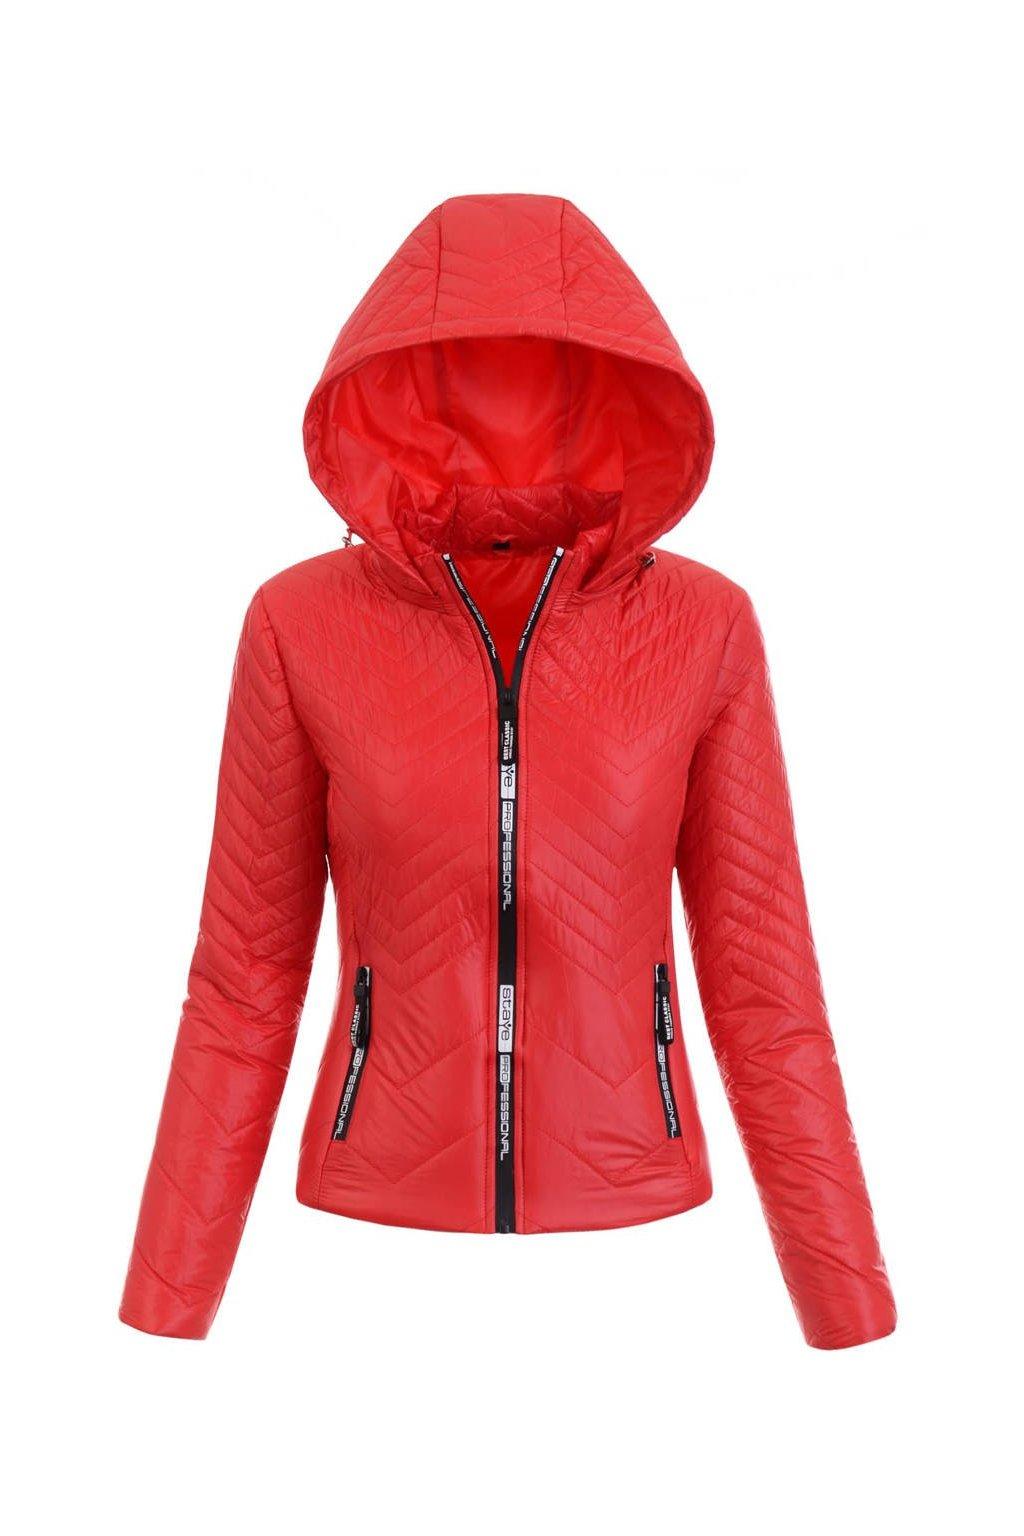 Dámska prechodná bunda s kapucňou 5426 červená